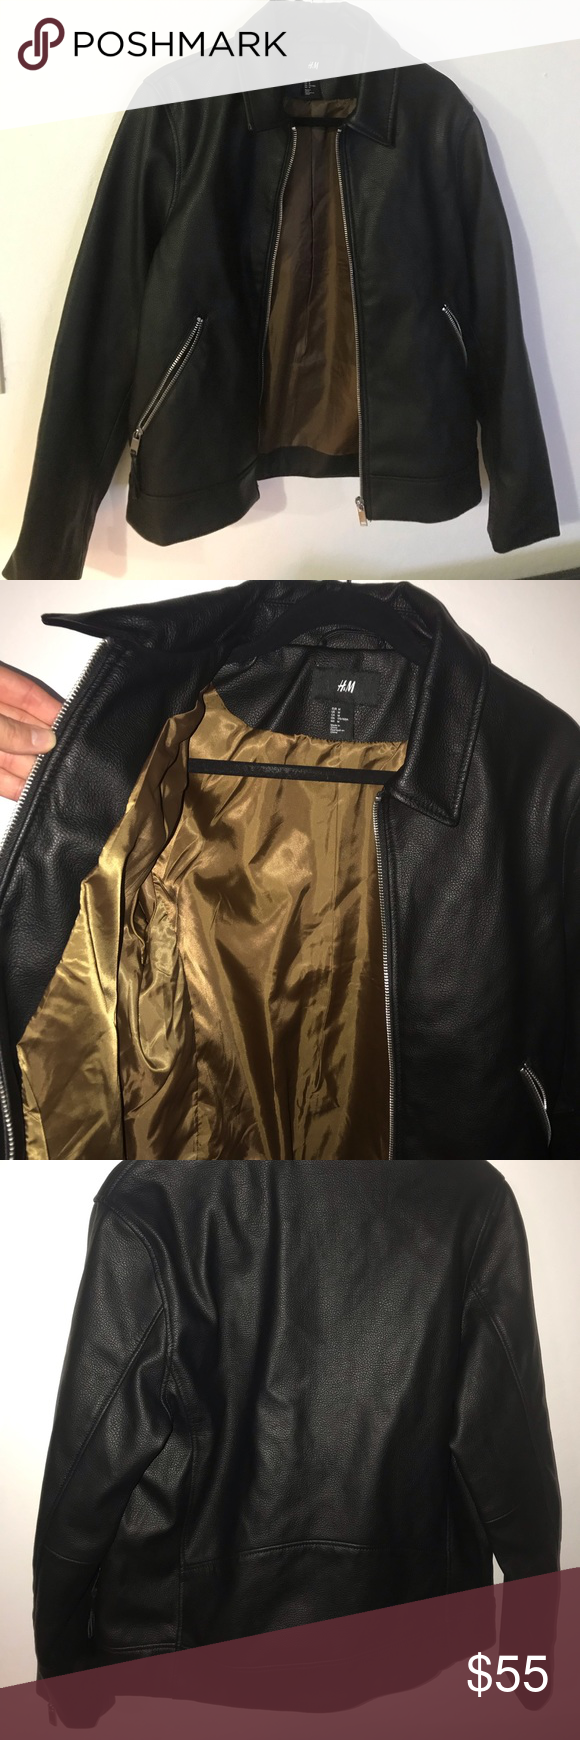 Men's H&M faux leather jacket. Medium Leather jacket